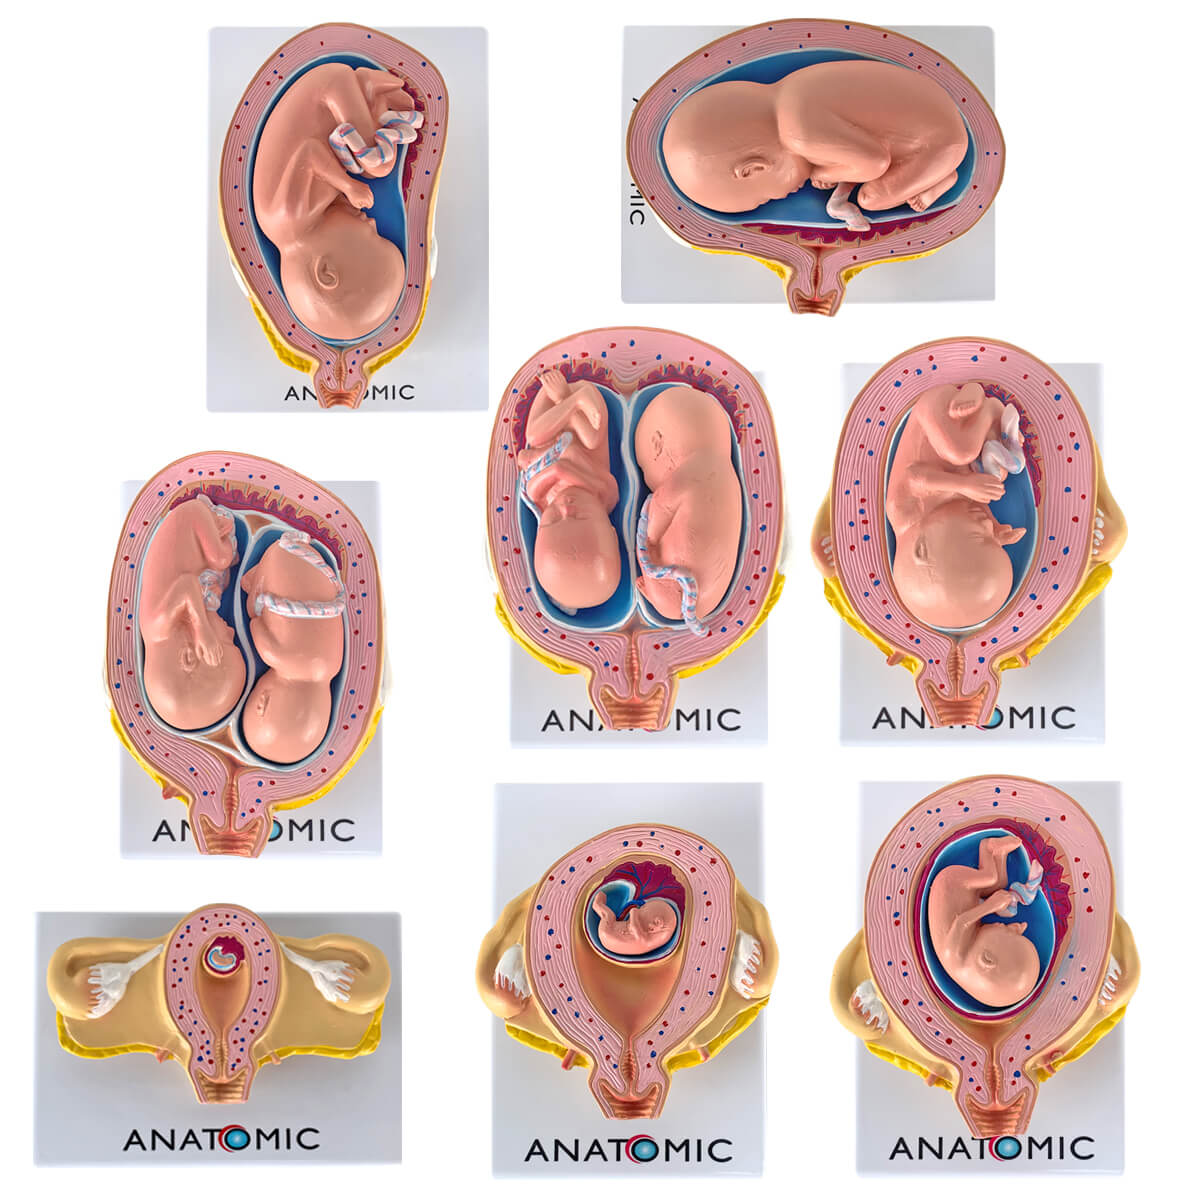 Modelo Anatomia Gravidez com 8 Fases